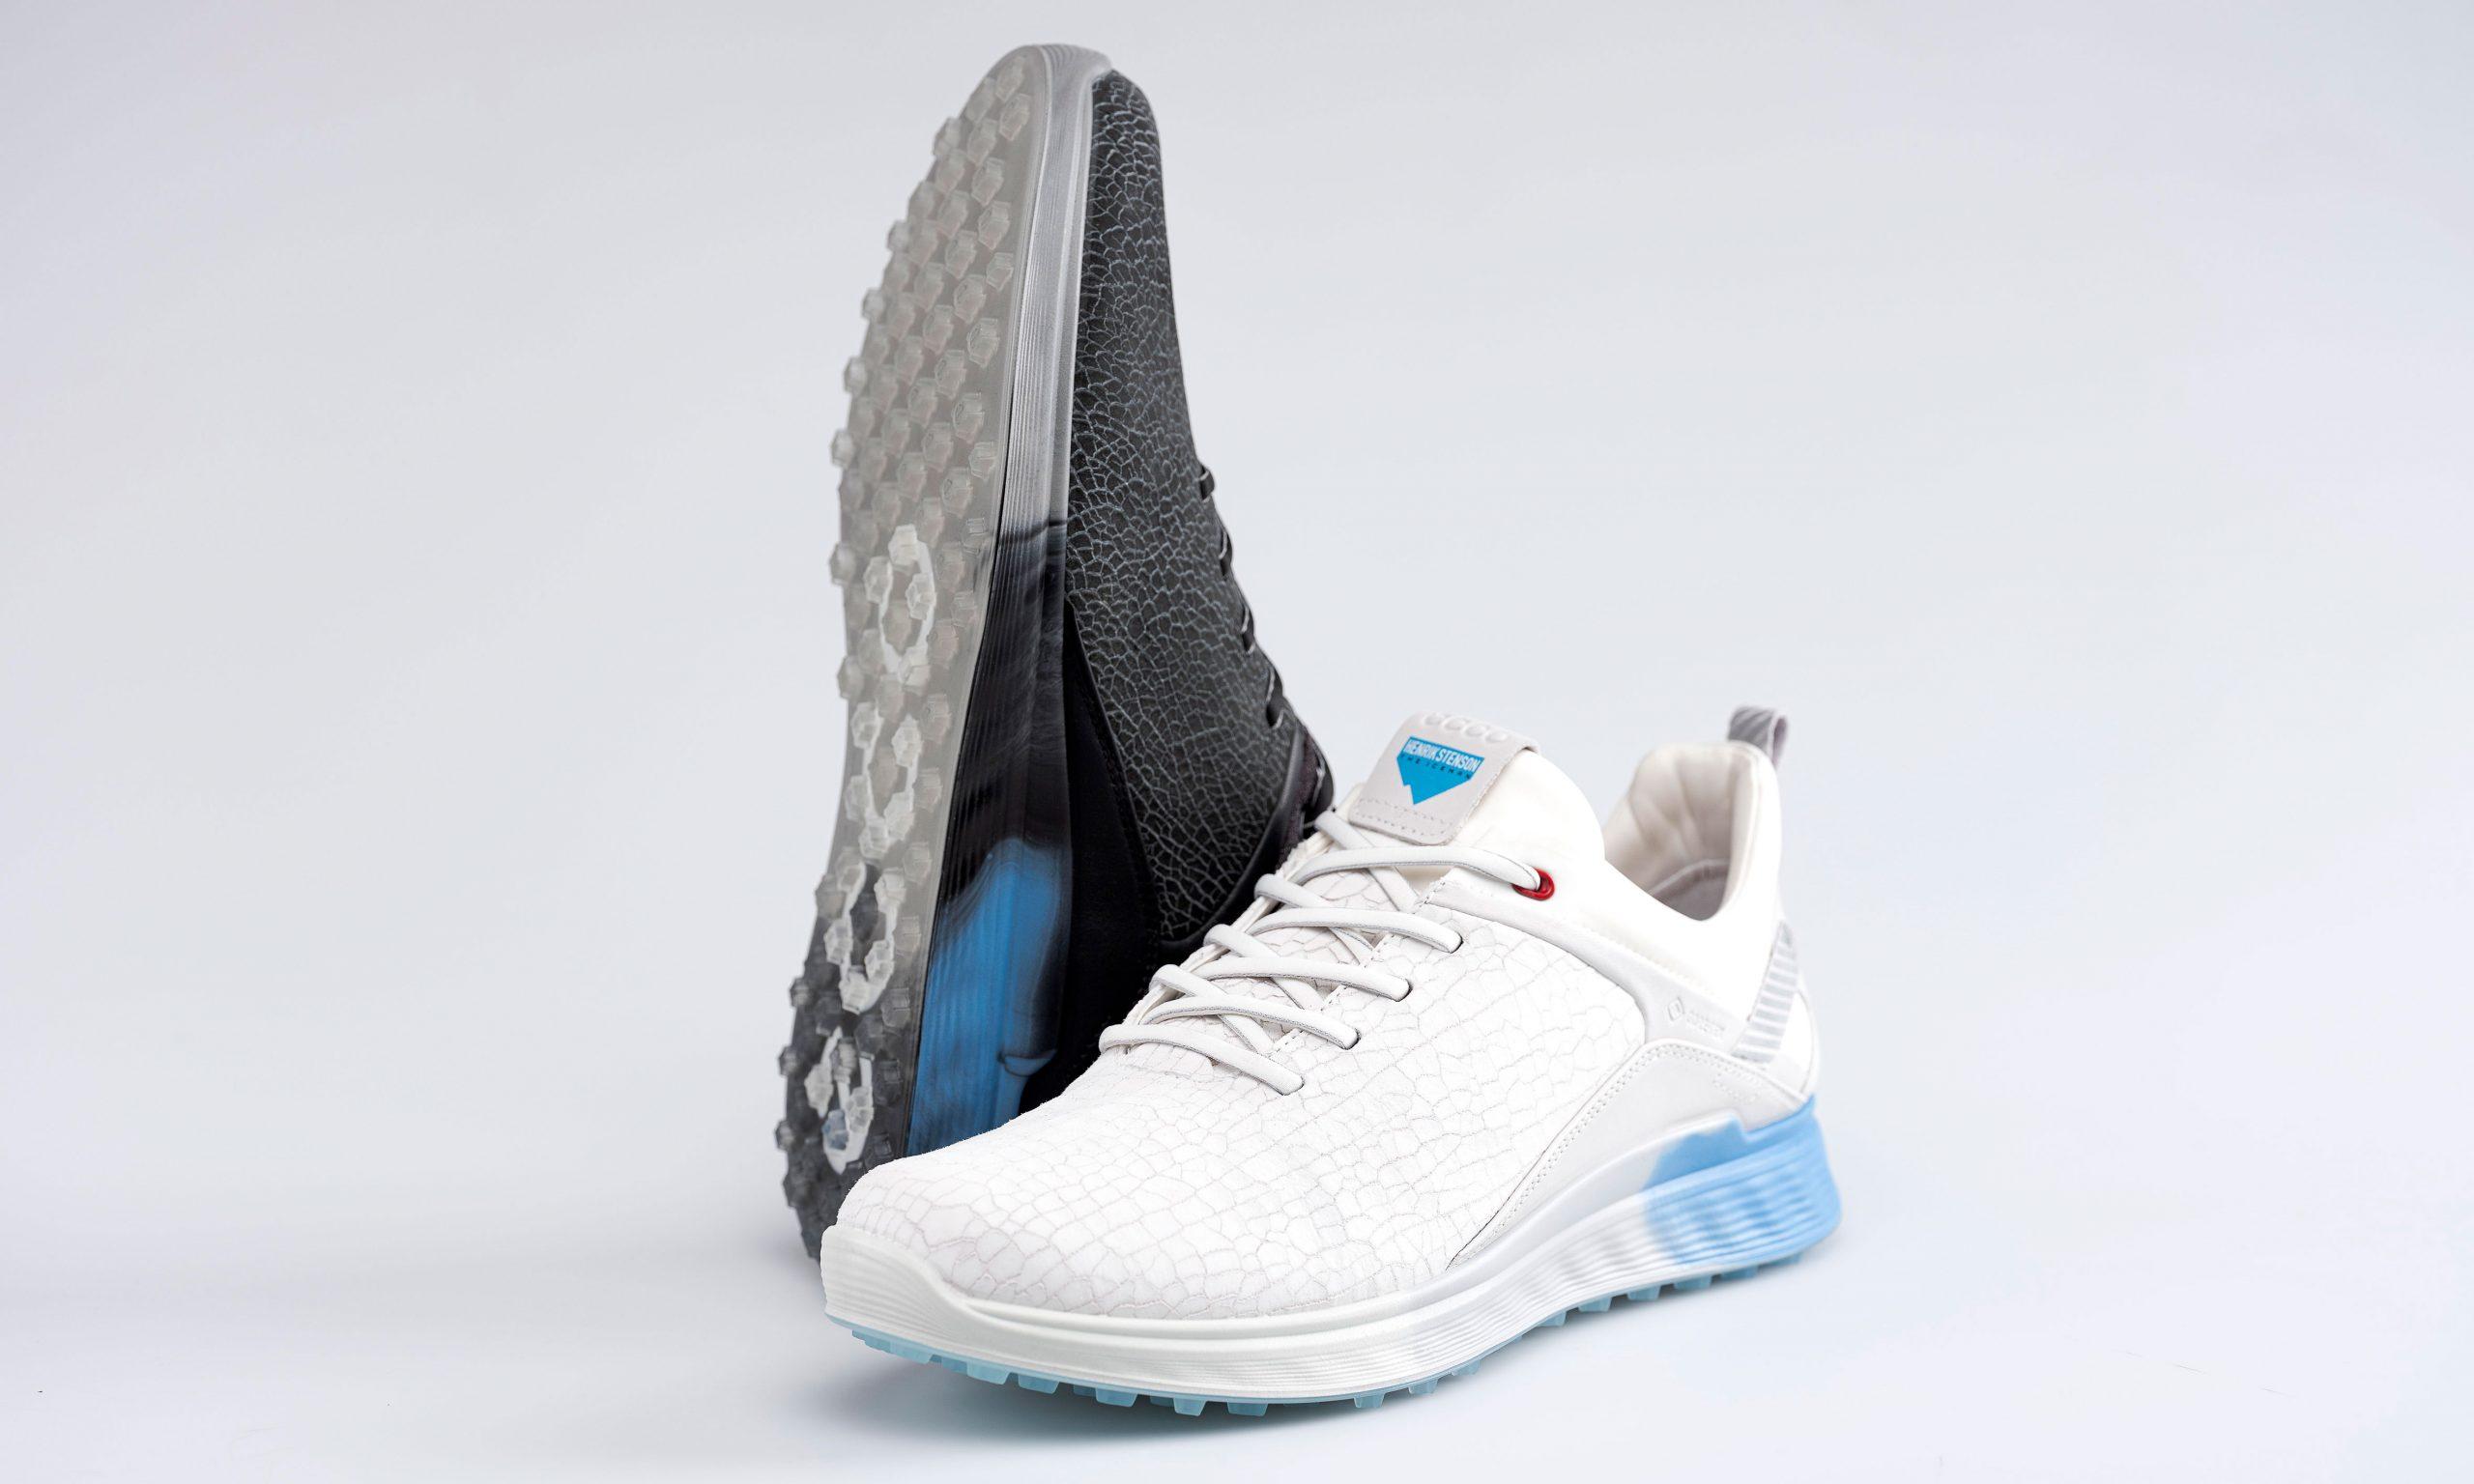 ECCO 高尔夫携手 Henrik Stenson 推出 S-THREE ICEMAN 特别版鞋款